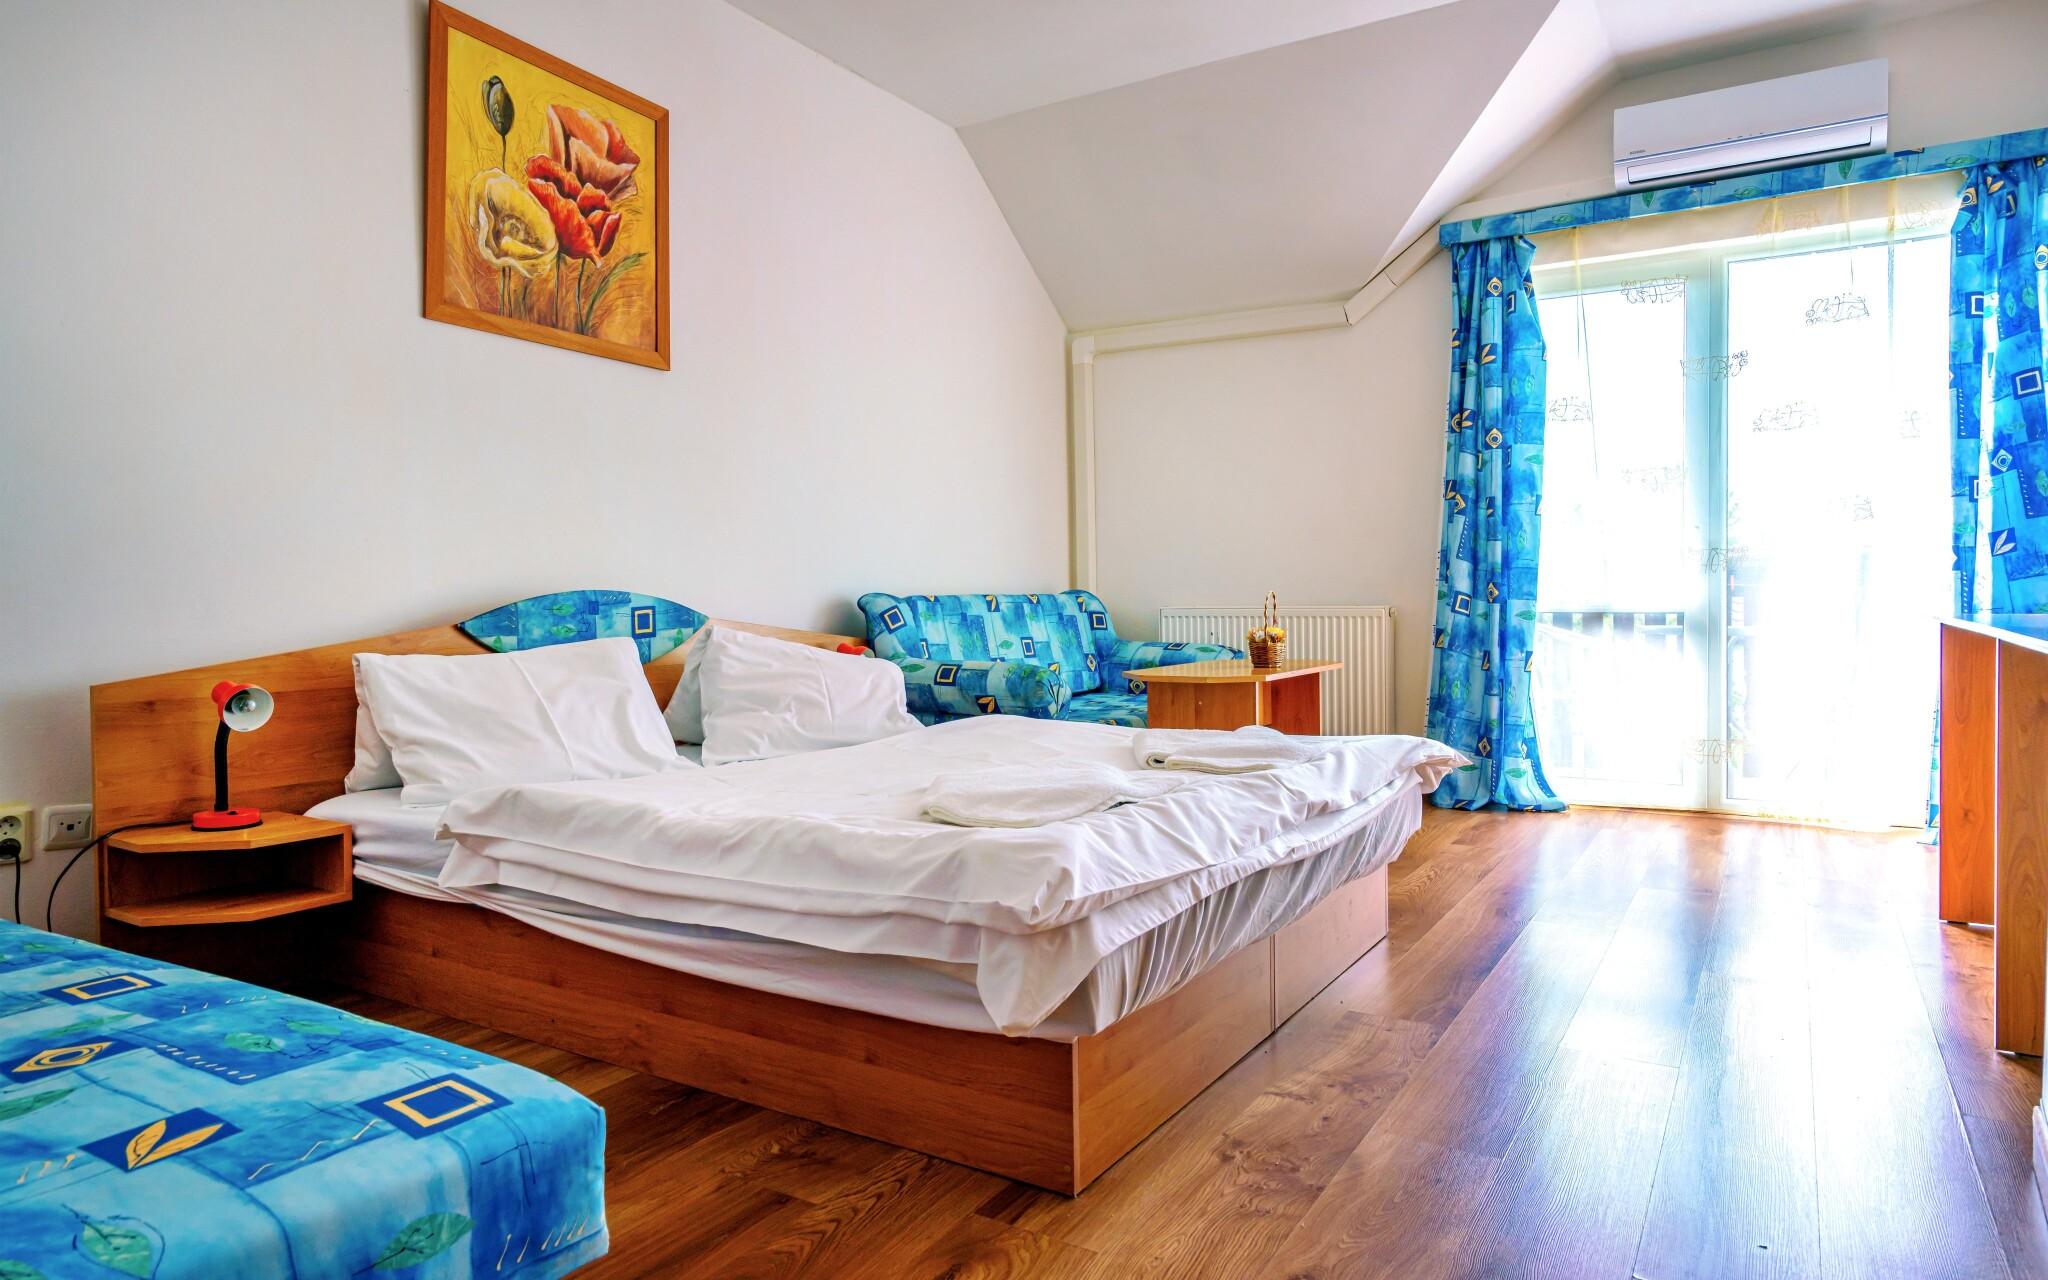 Ubytovaní budete v pohodlných izbách